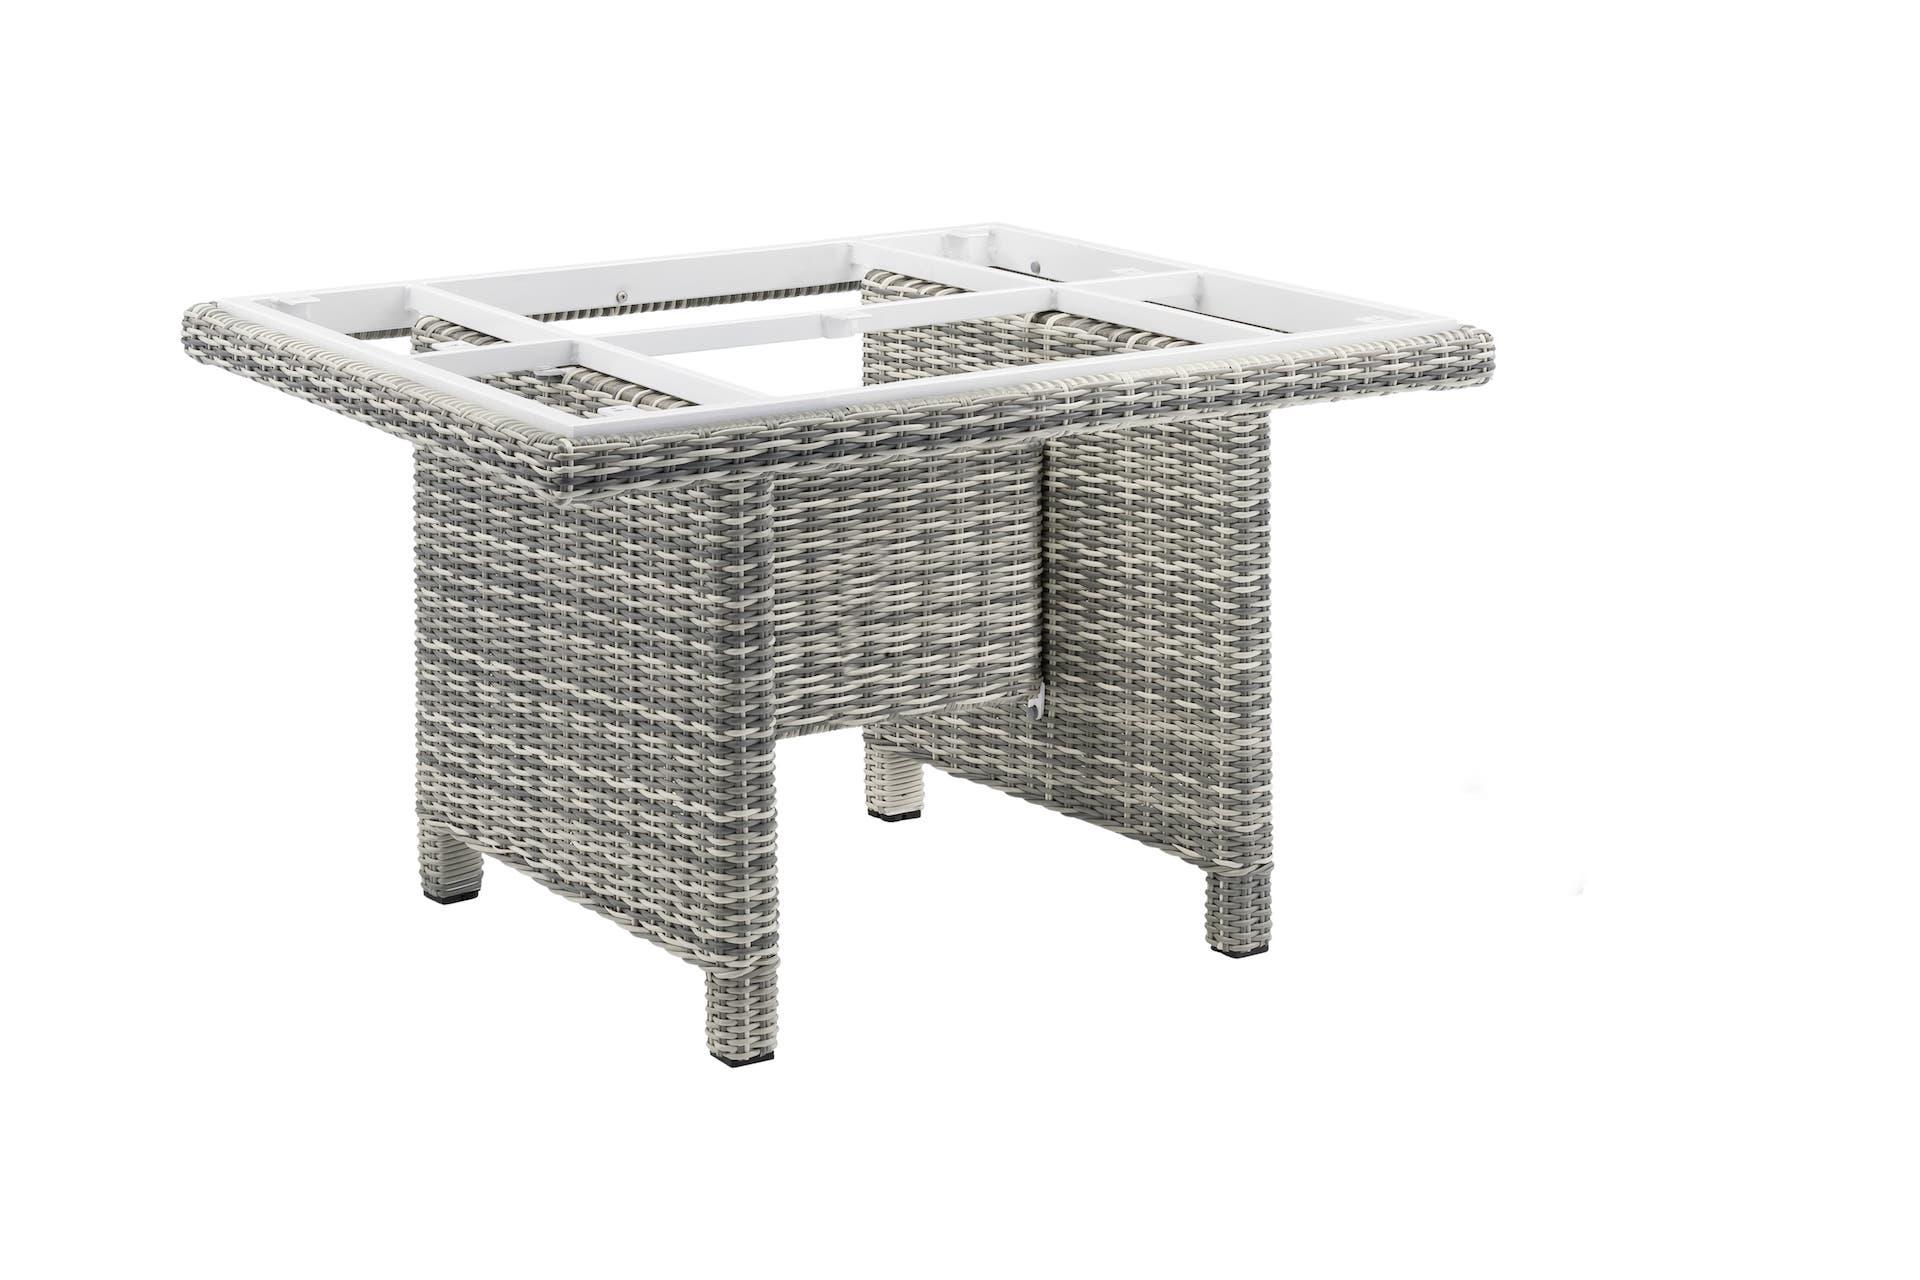 PALMA MODULAR Casual Dining Tischgestell 93 x 93 cm